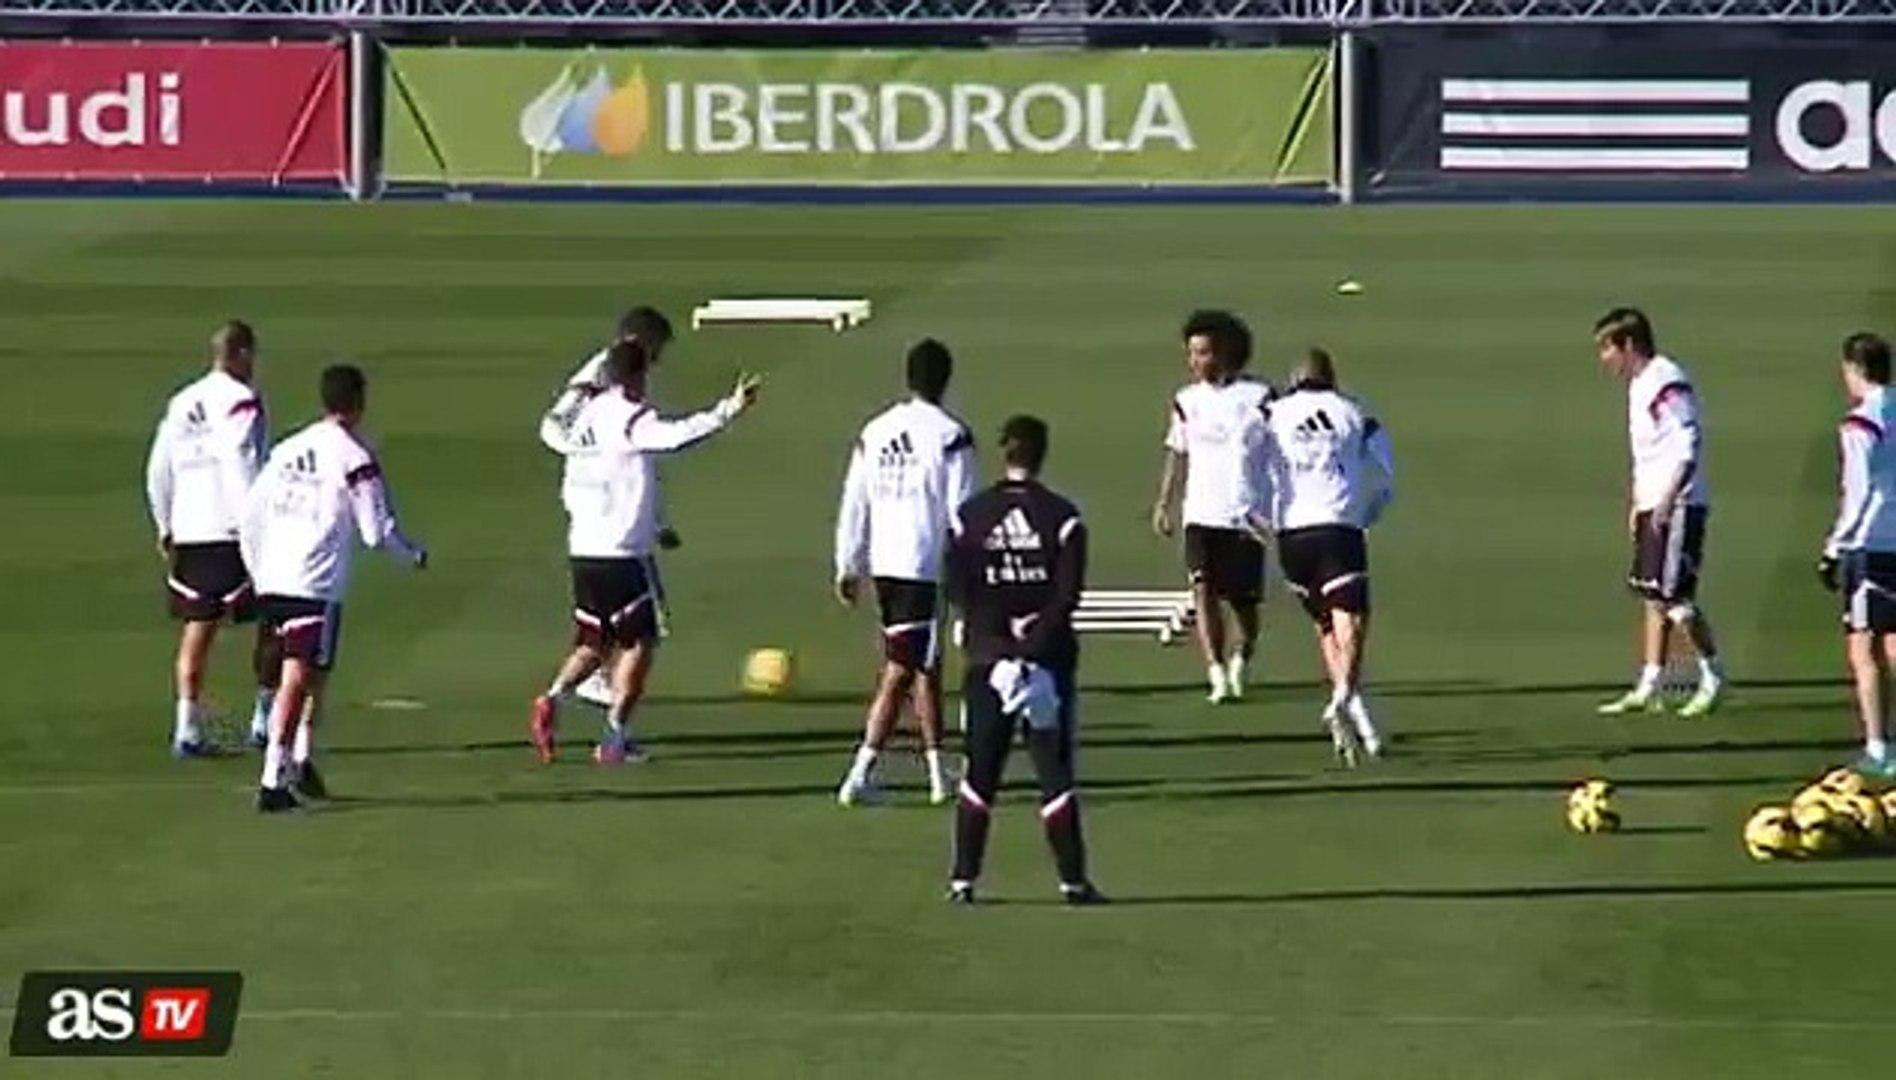 Clip Ronaldo pho dien ky thuat nhung bi cho la da cham bong 2 lan